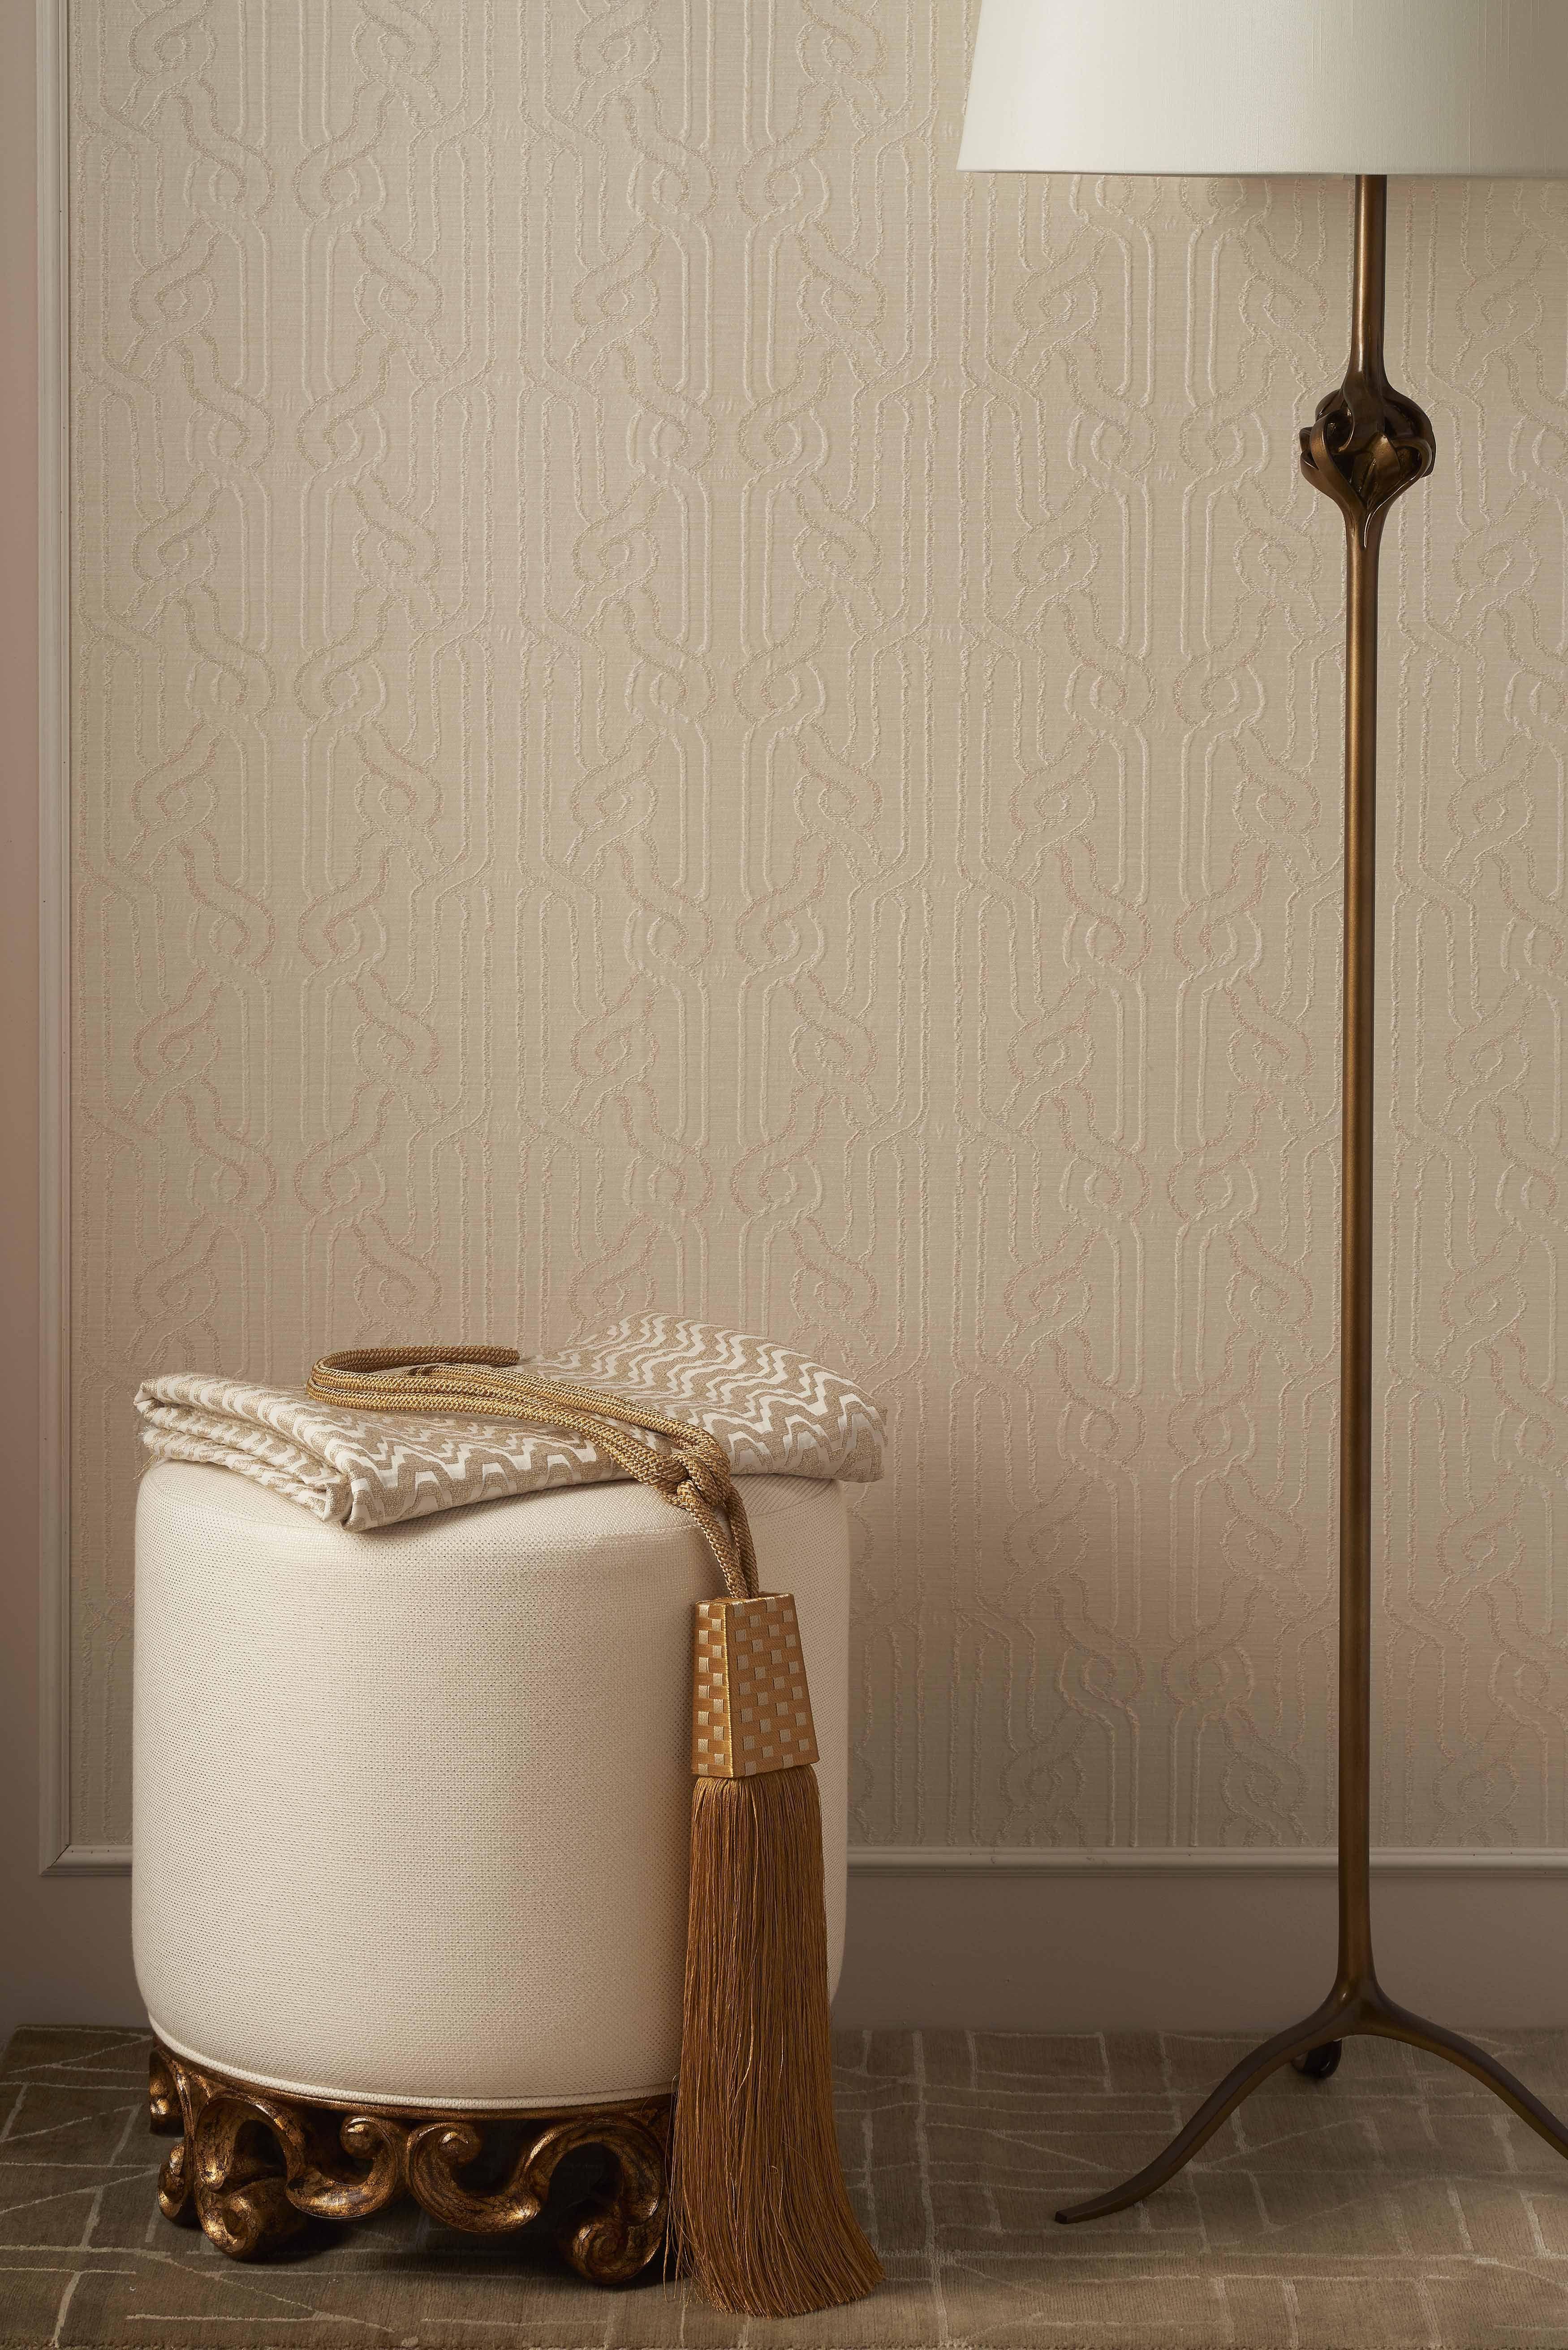 Eclairage Floor Lamp Antique Brass Christopher Guy Sikim Rug Grey Jacarandacarpet Glyph London Design Week Beautiful Lighting Christopher Guy